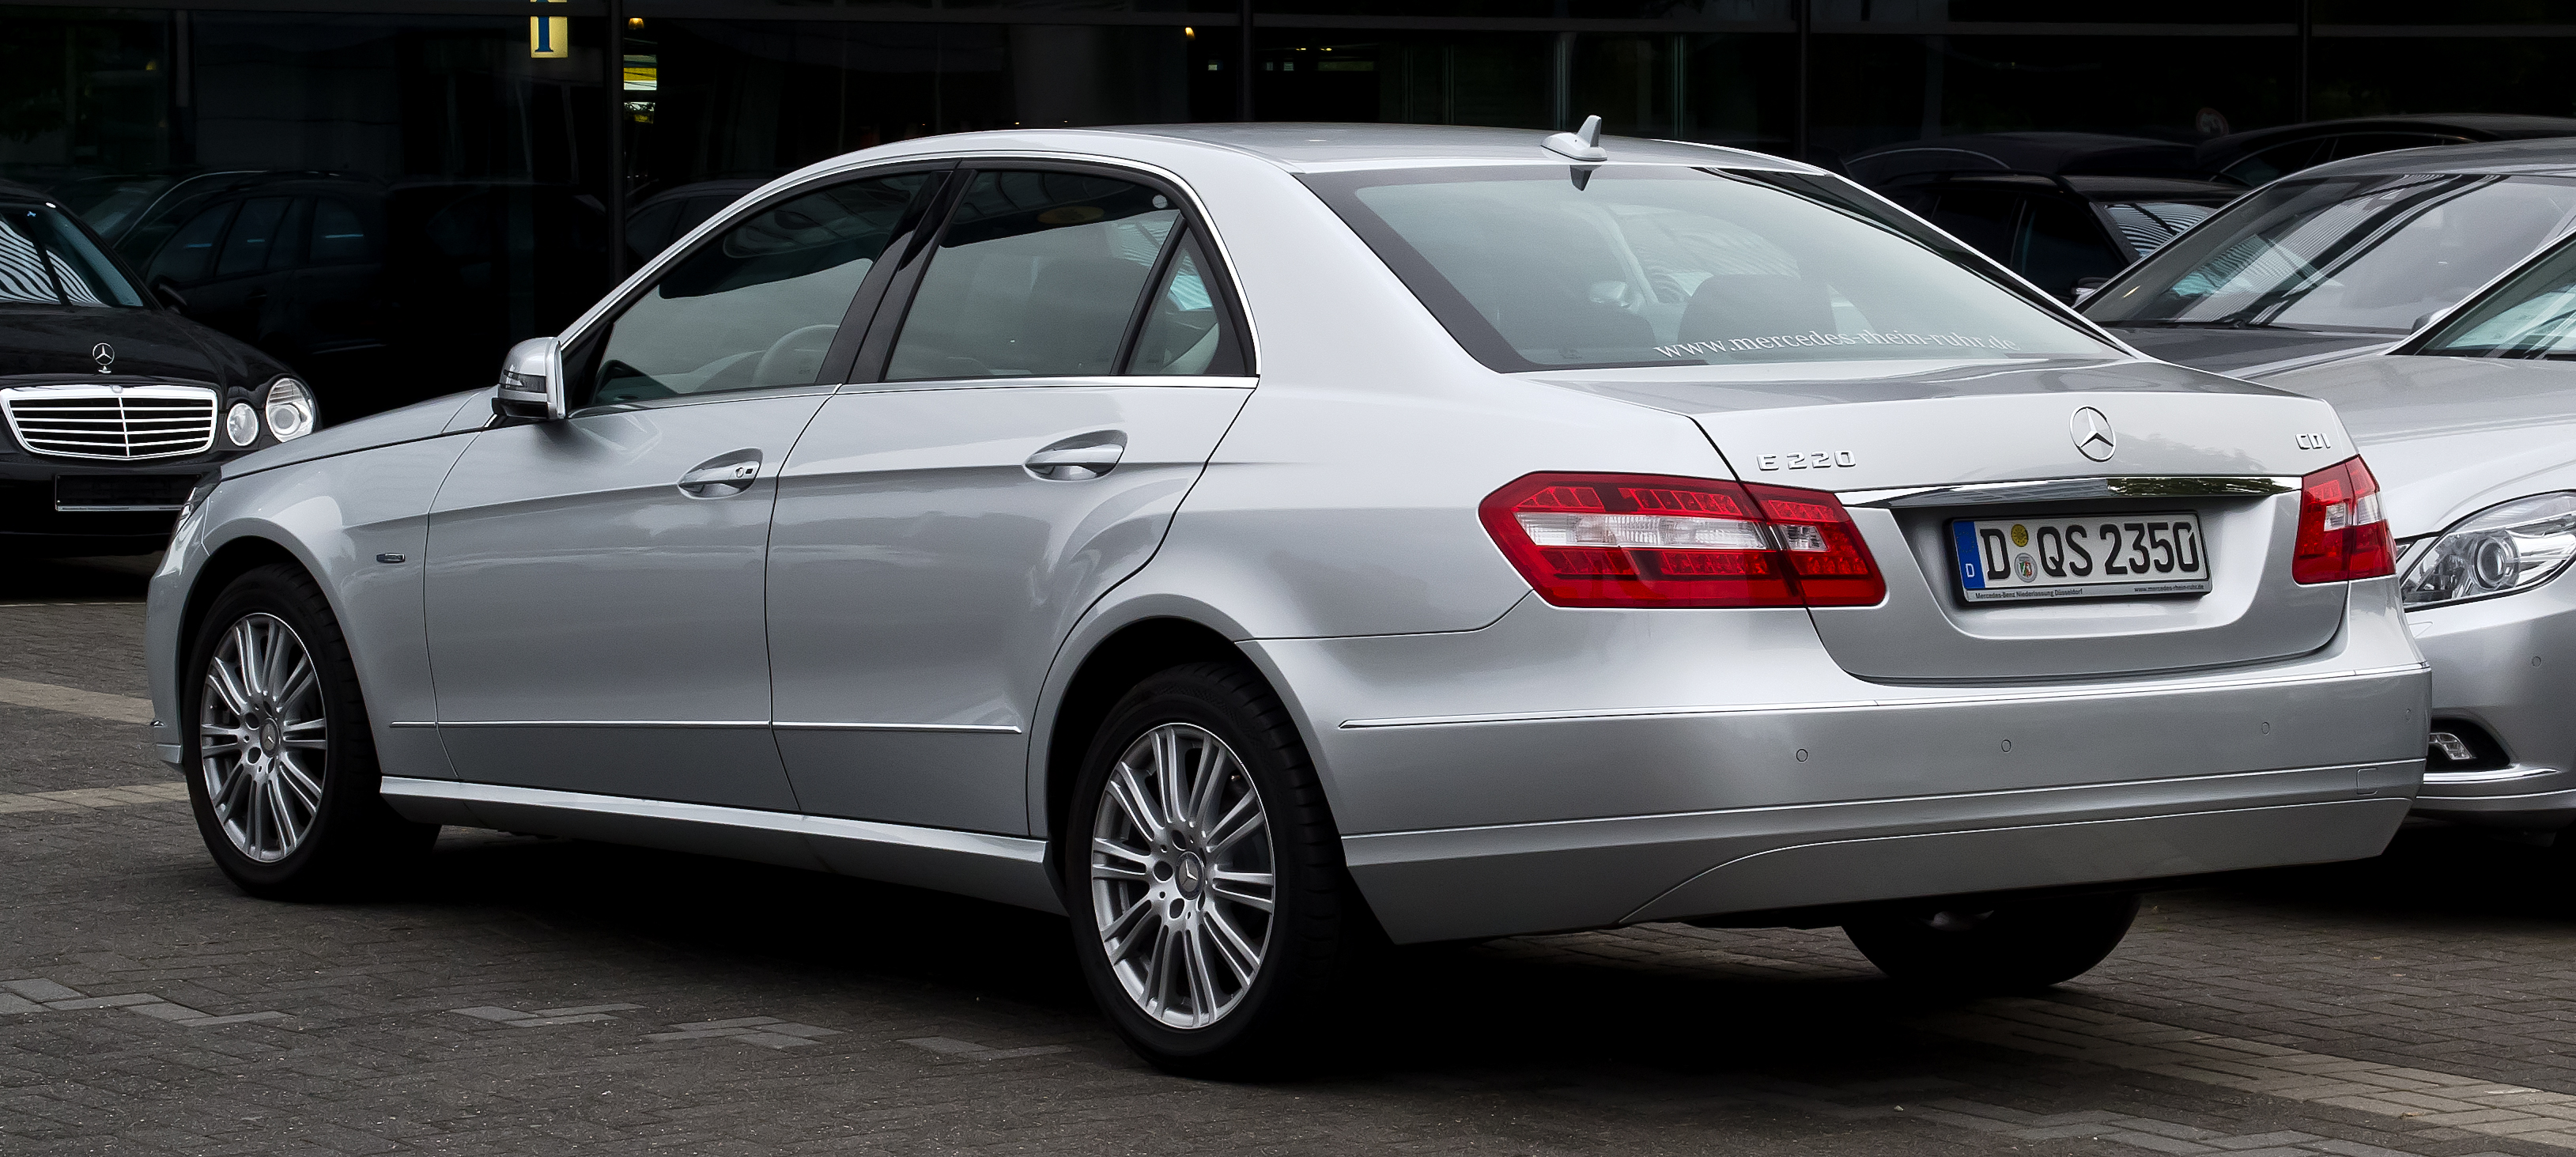 Mercedes E Cdi Avantgarde Avis